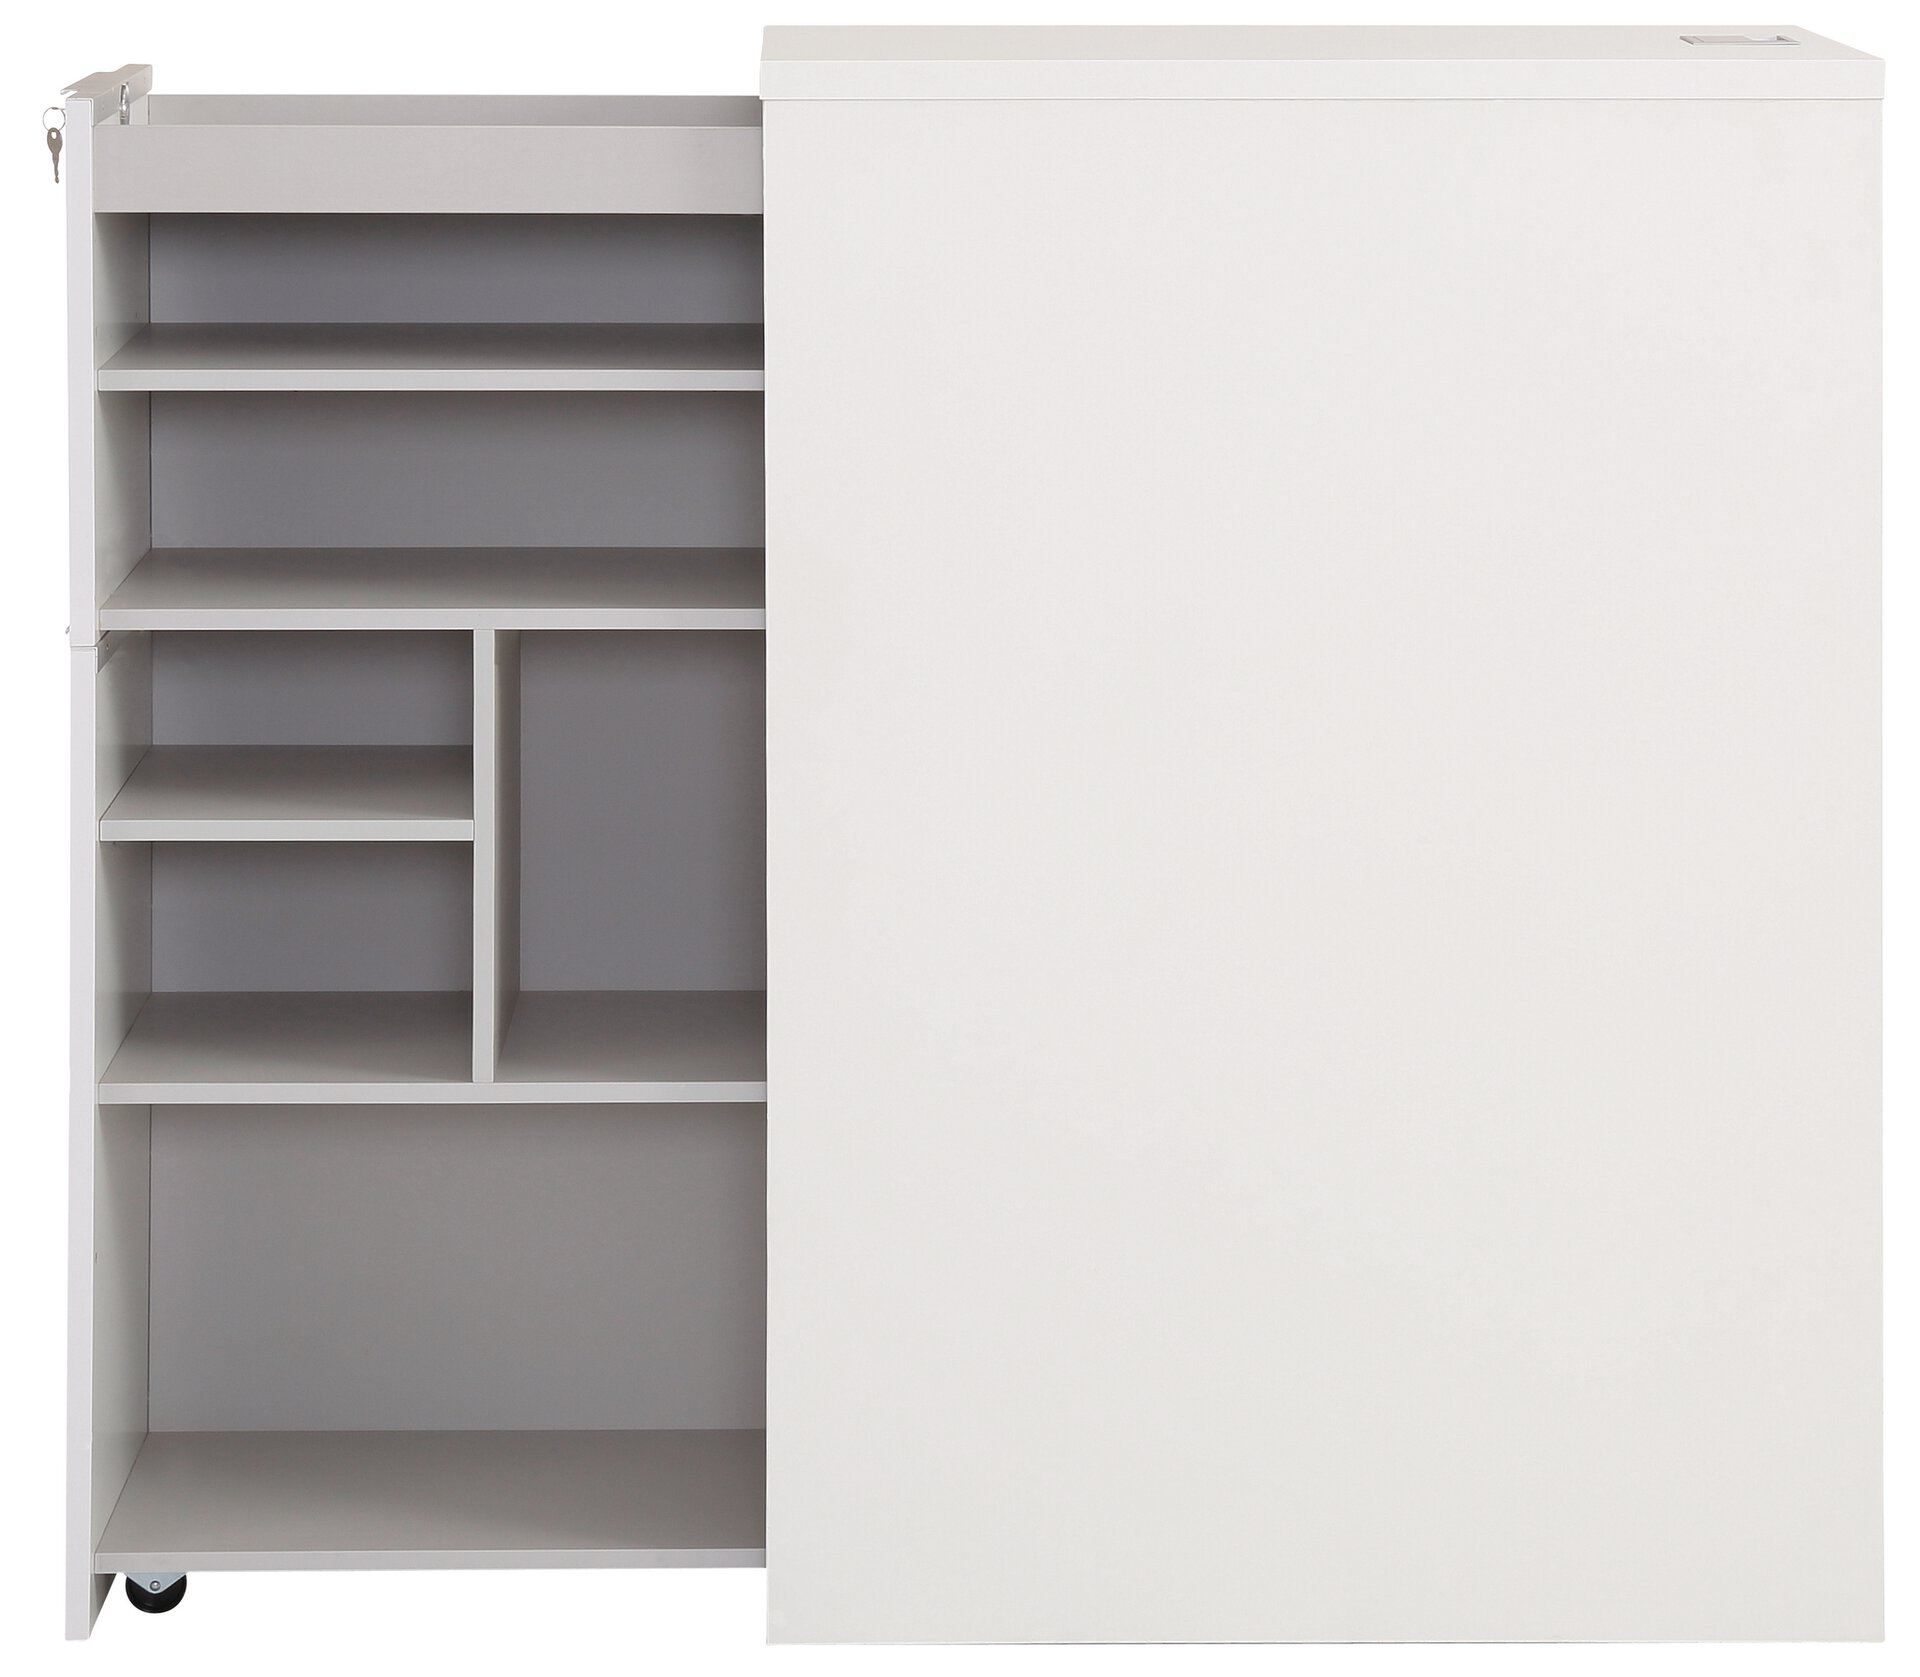 Standcontainer moveDJUST Maja Möbel Holzwerkstoff weiß 80 x 115 x 44 cm